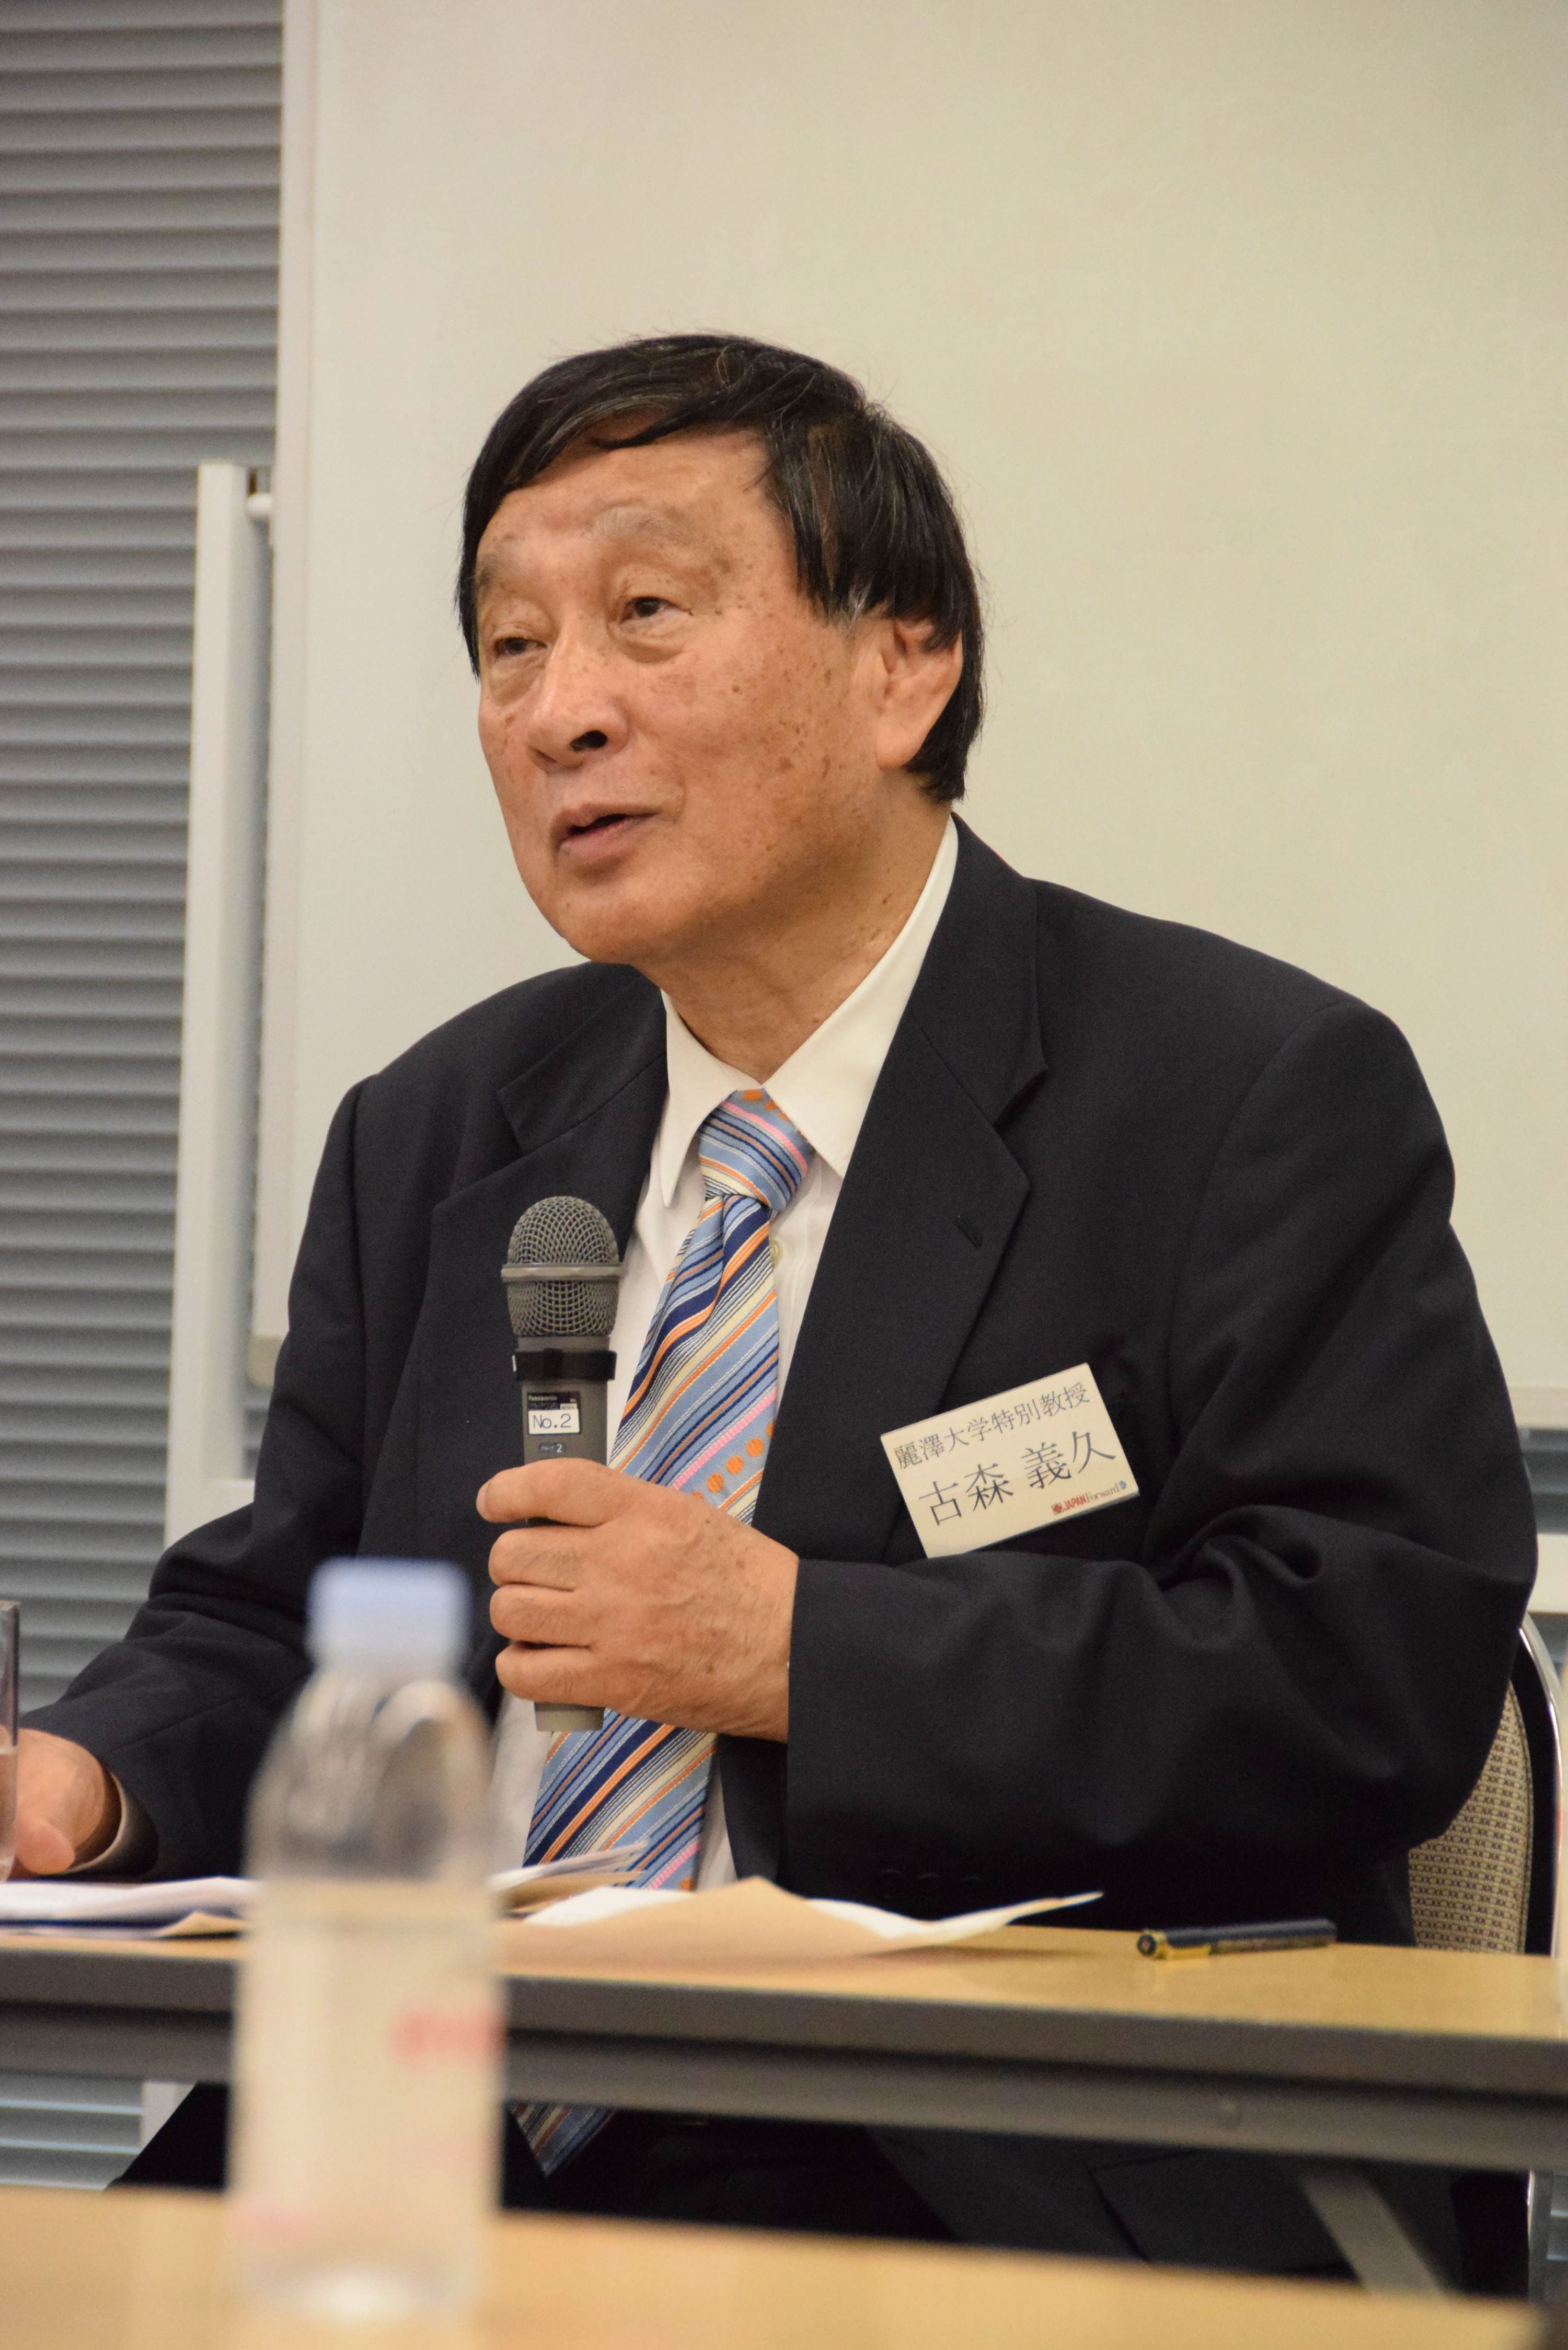 Yoshihisa Komori, The Sankei Shimbun's associate correspondent in Washington, D.C.